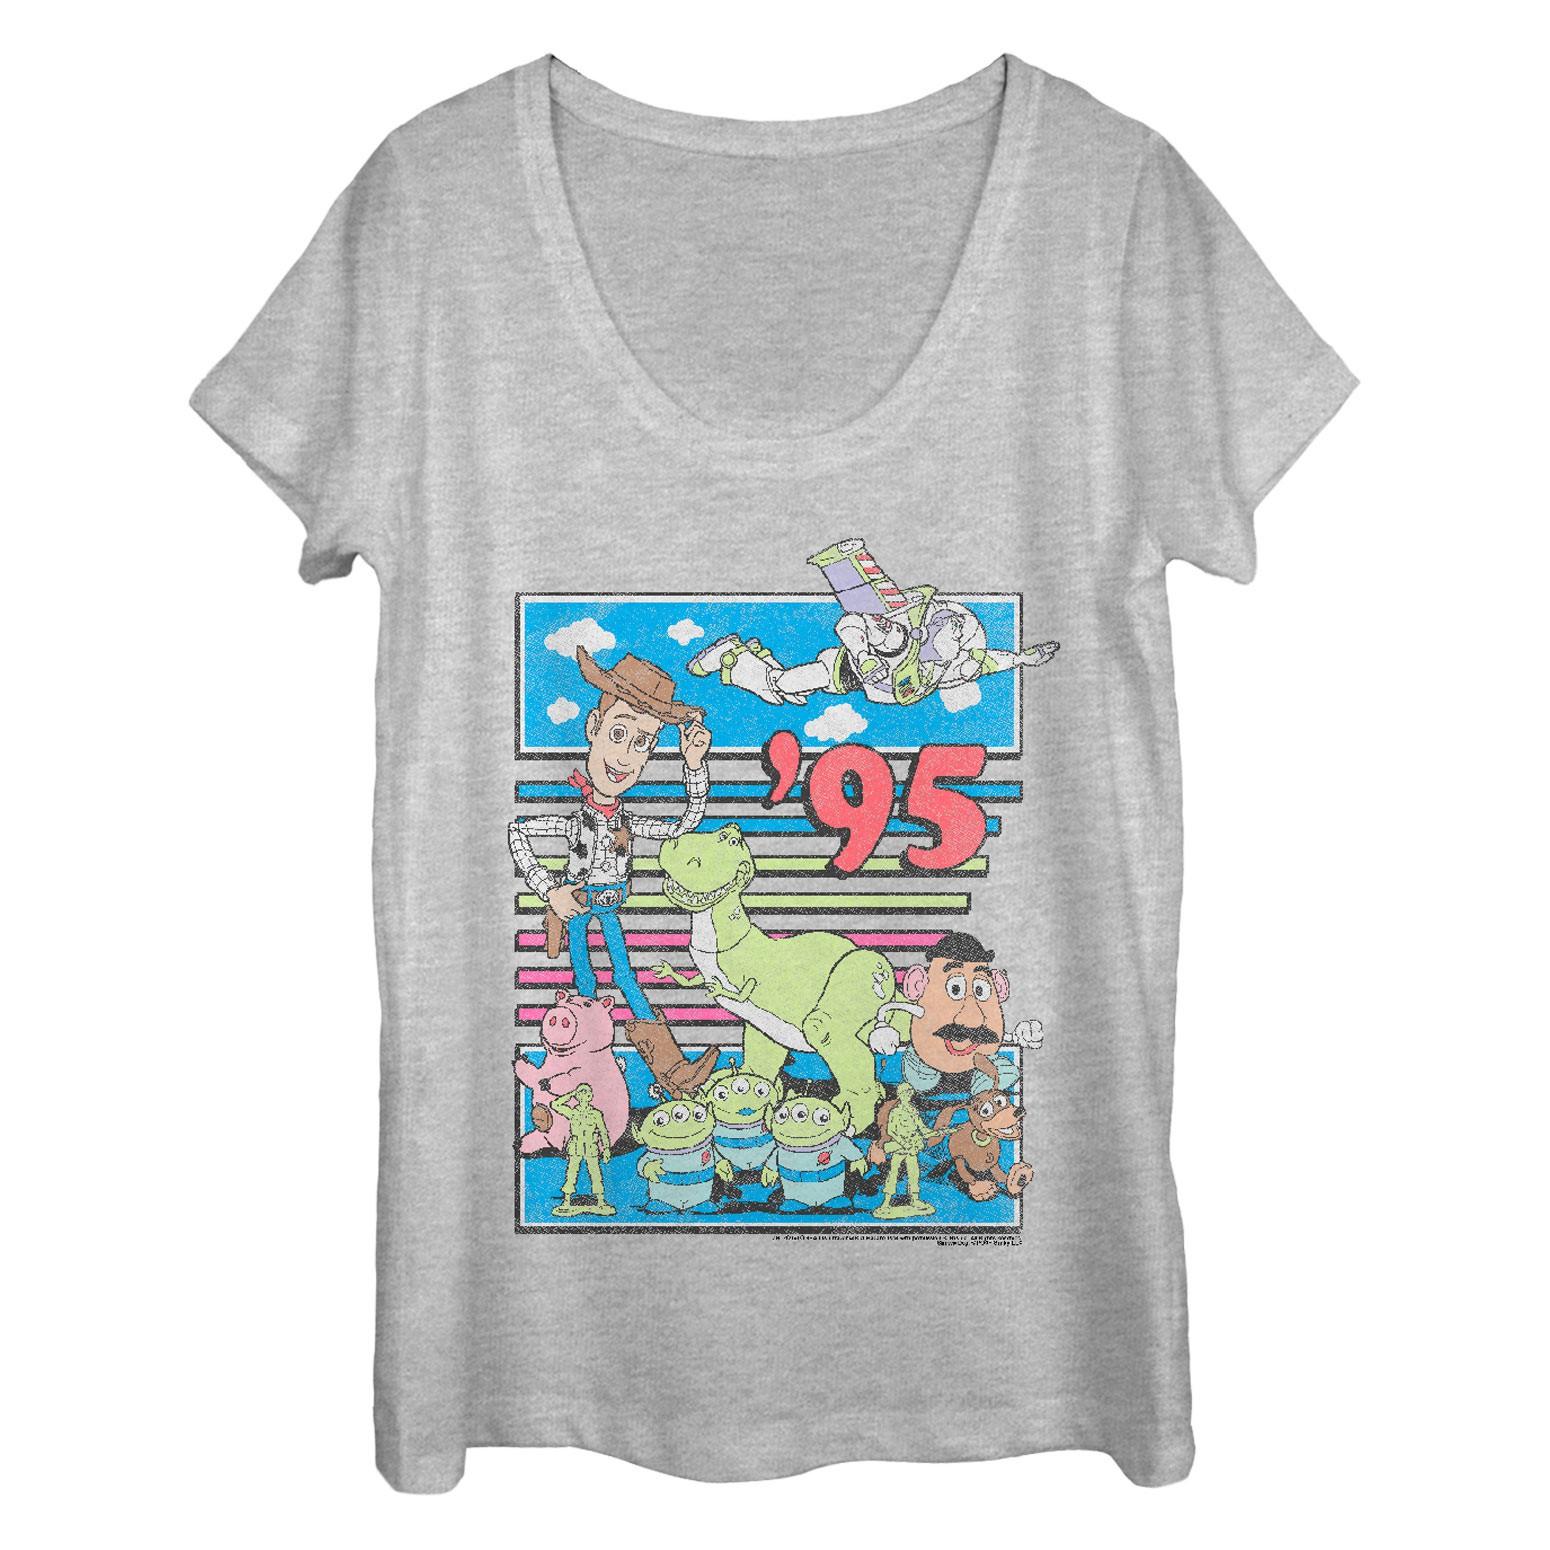 Toy Story '95 Ladies Grey Scoop Neck Tee Shirt